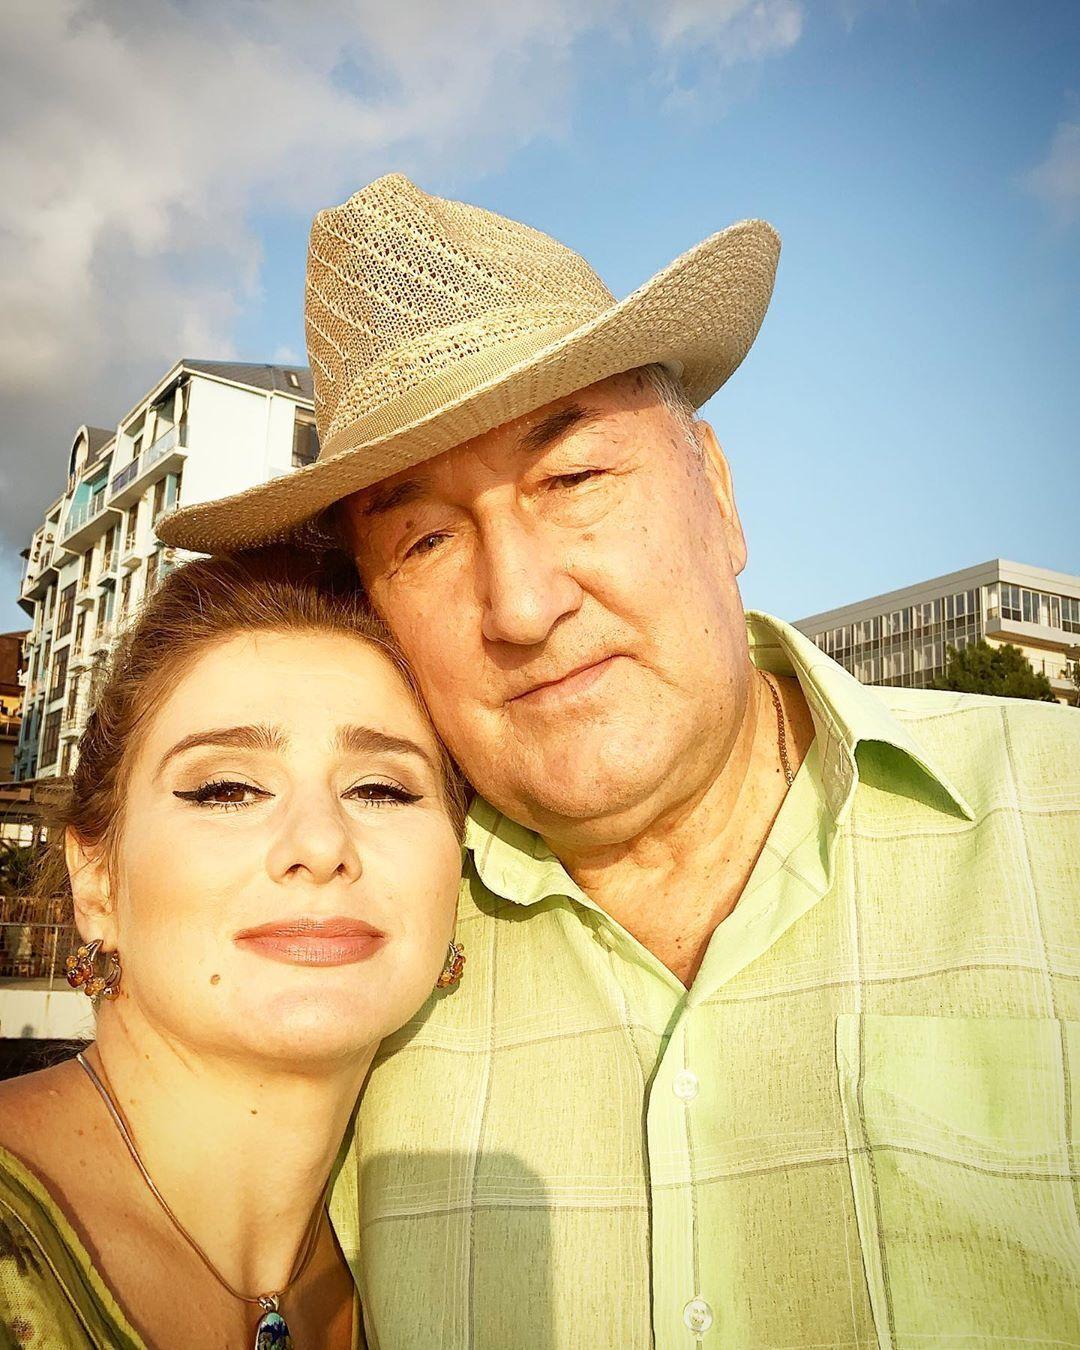 Юлия Куварзина и Борис Клюев (Instagram Юлии Куварзиной)